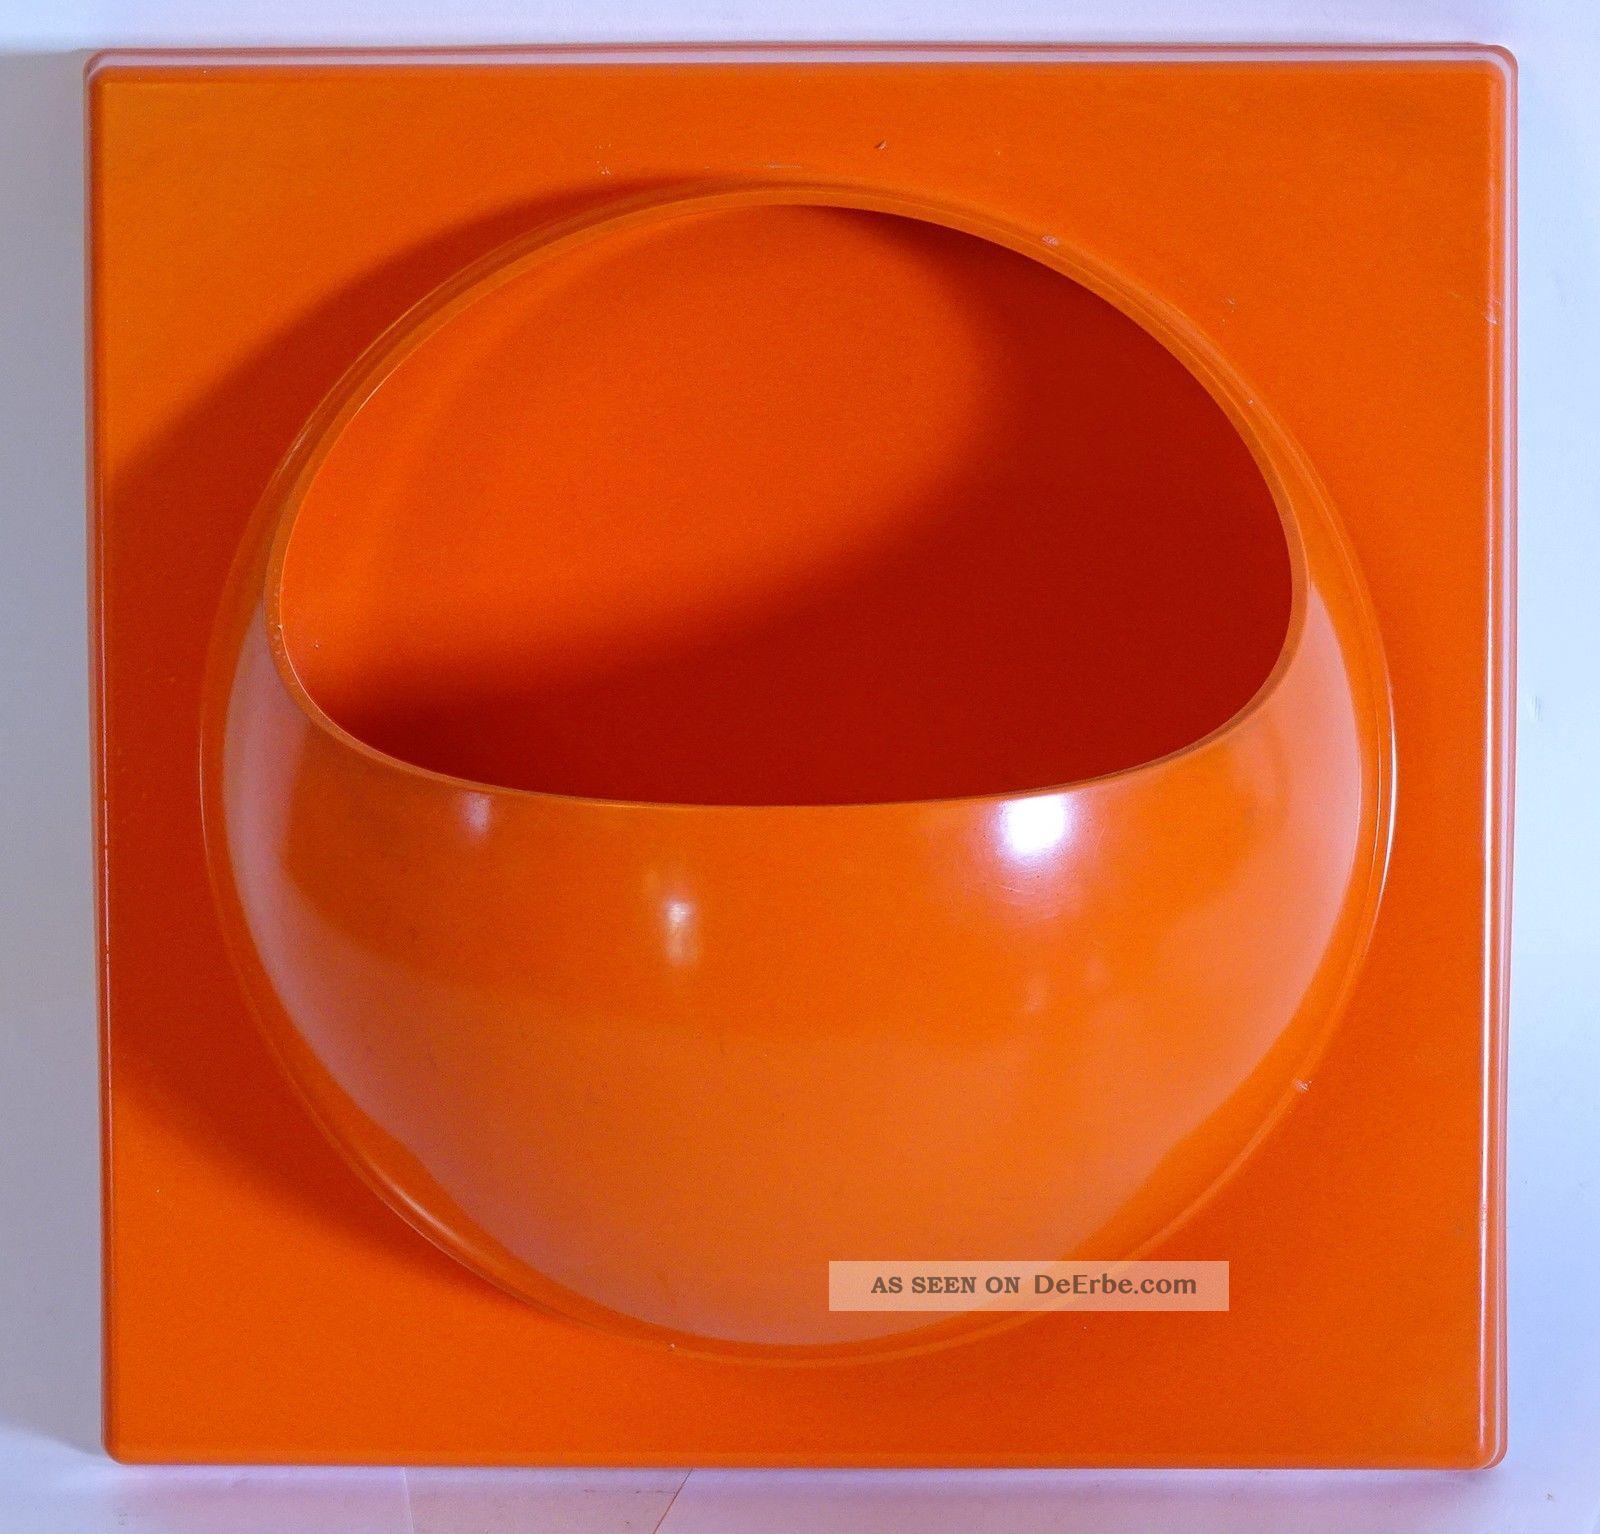 Schönbuch 70er Jahre Design Wand Box Quadro Lack Orange Space Age Wandregal 1970-1979 Bild